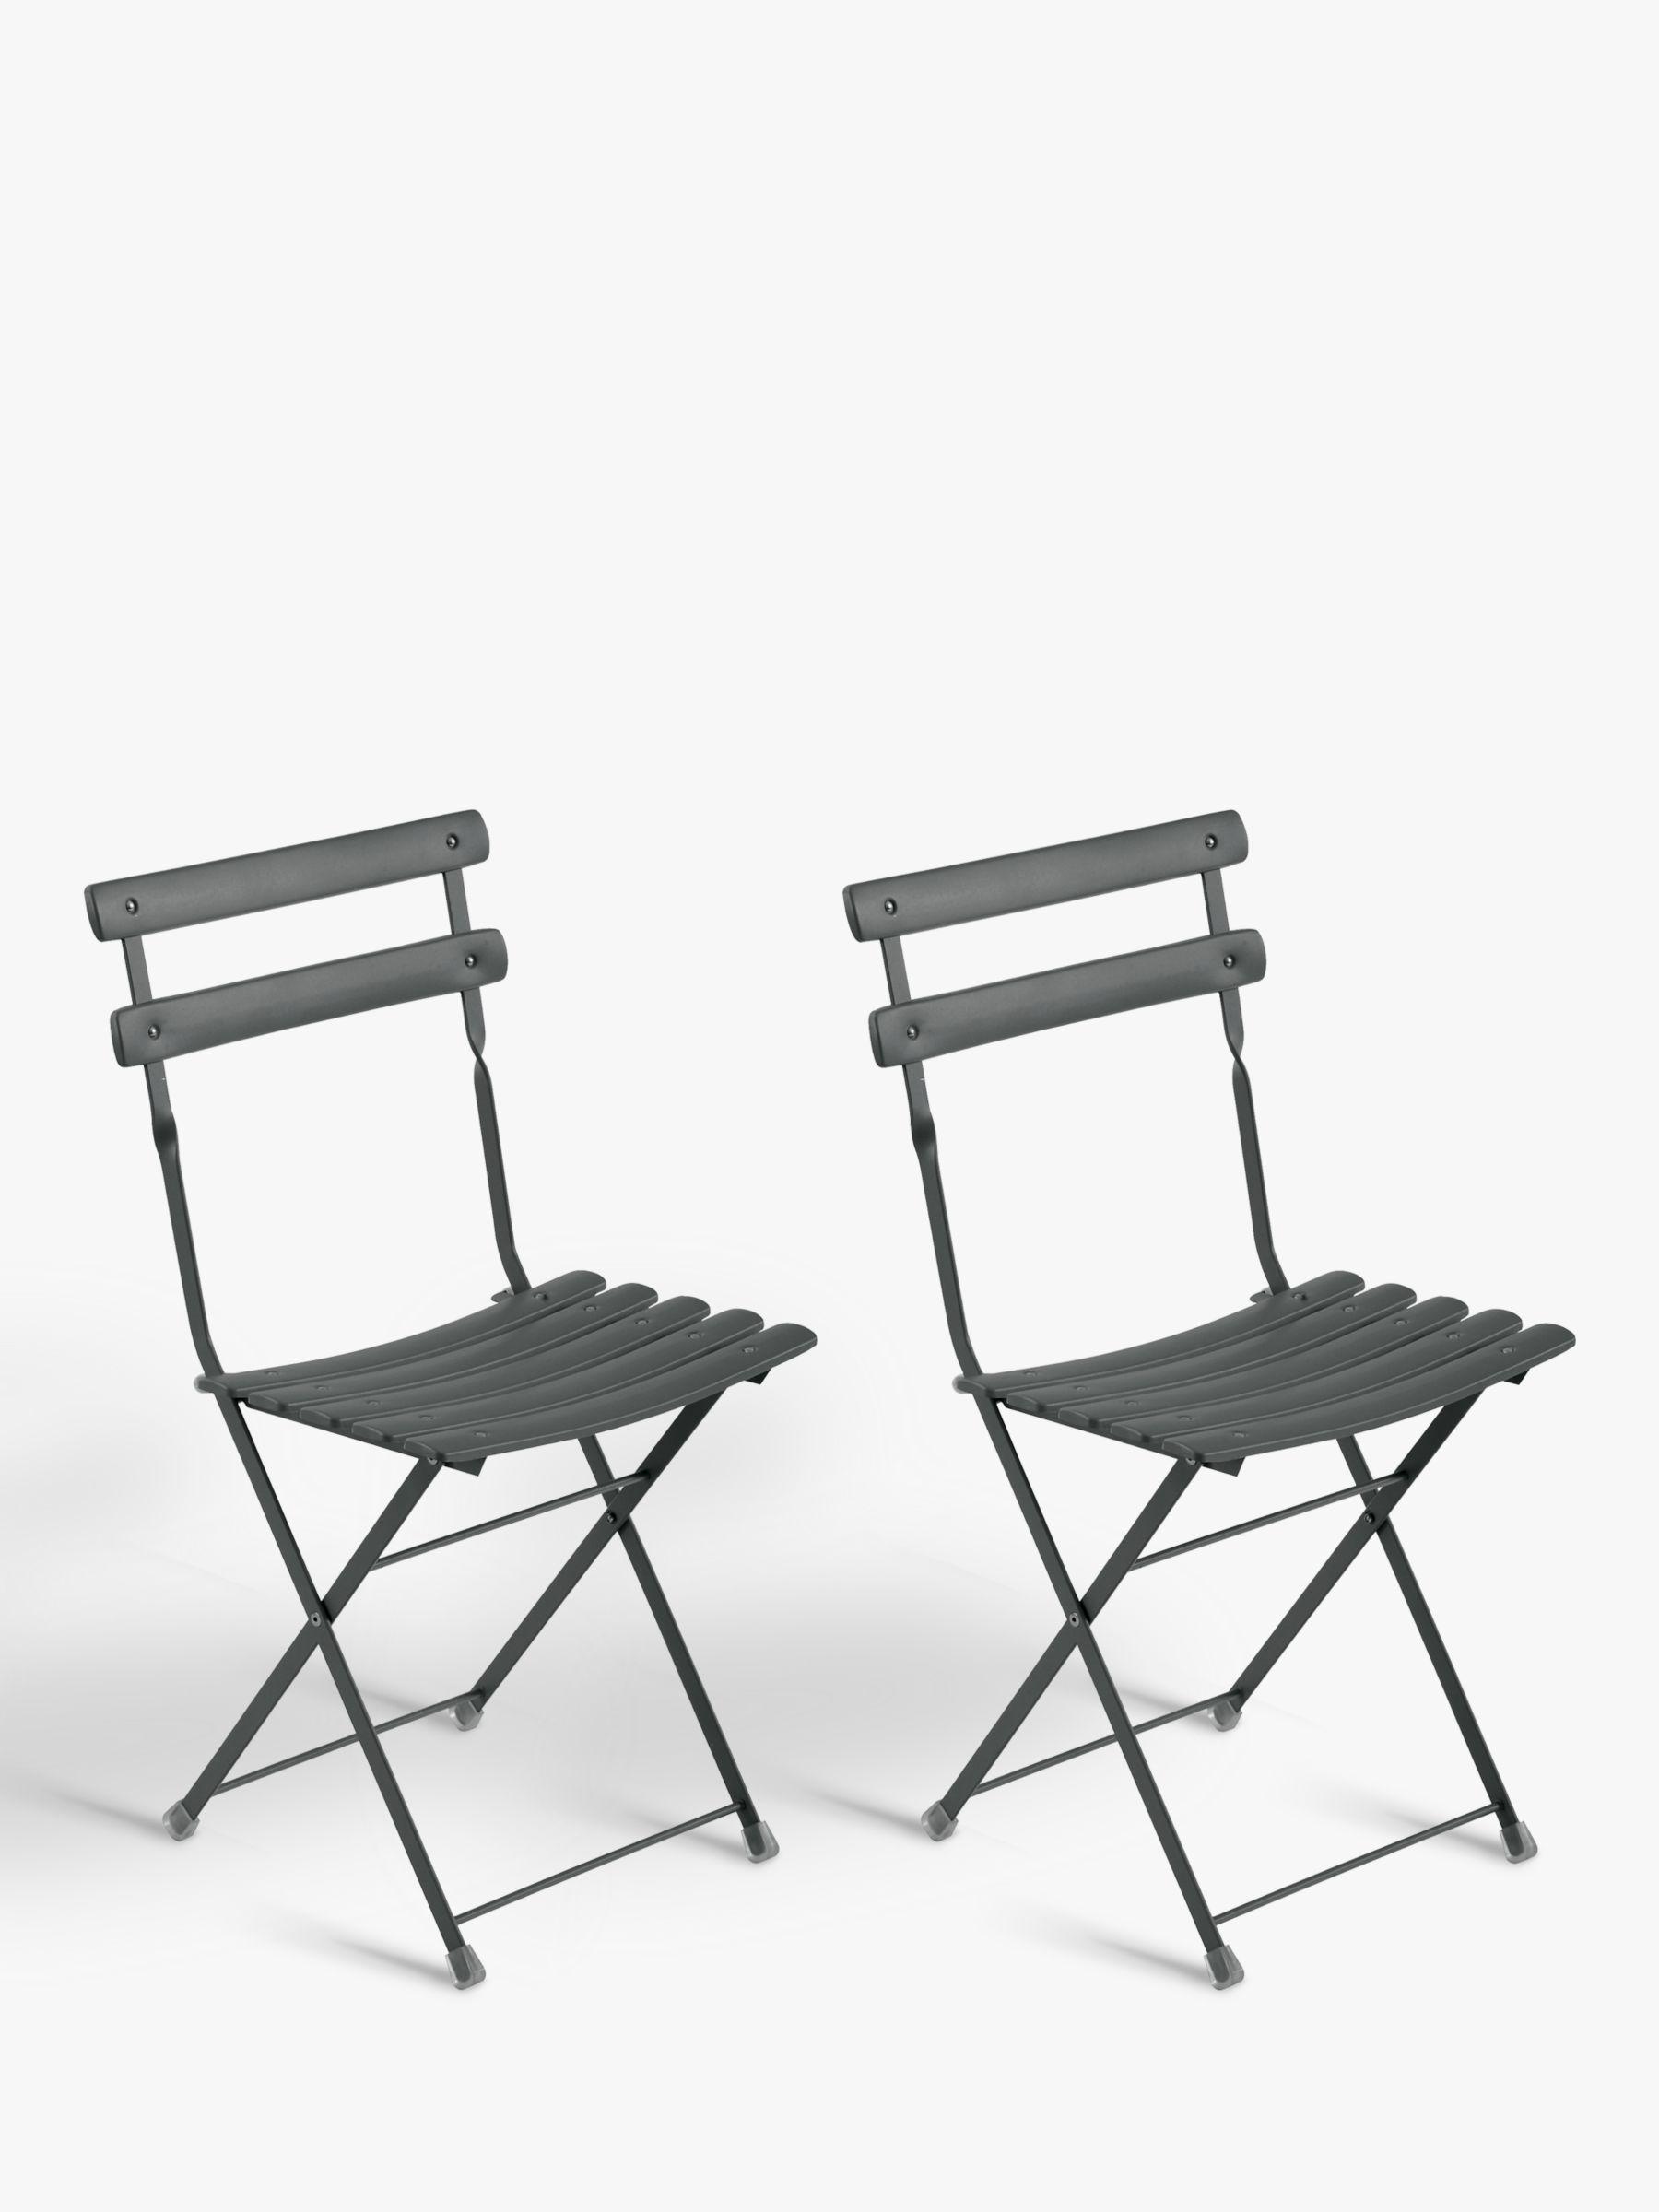 EMU Arc En Ciel Set of 2 Outdoor Chairs, Iron